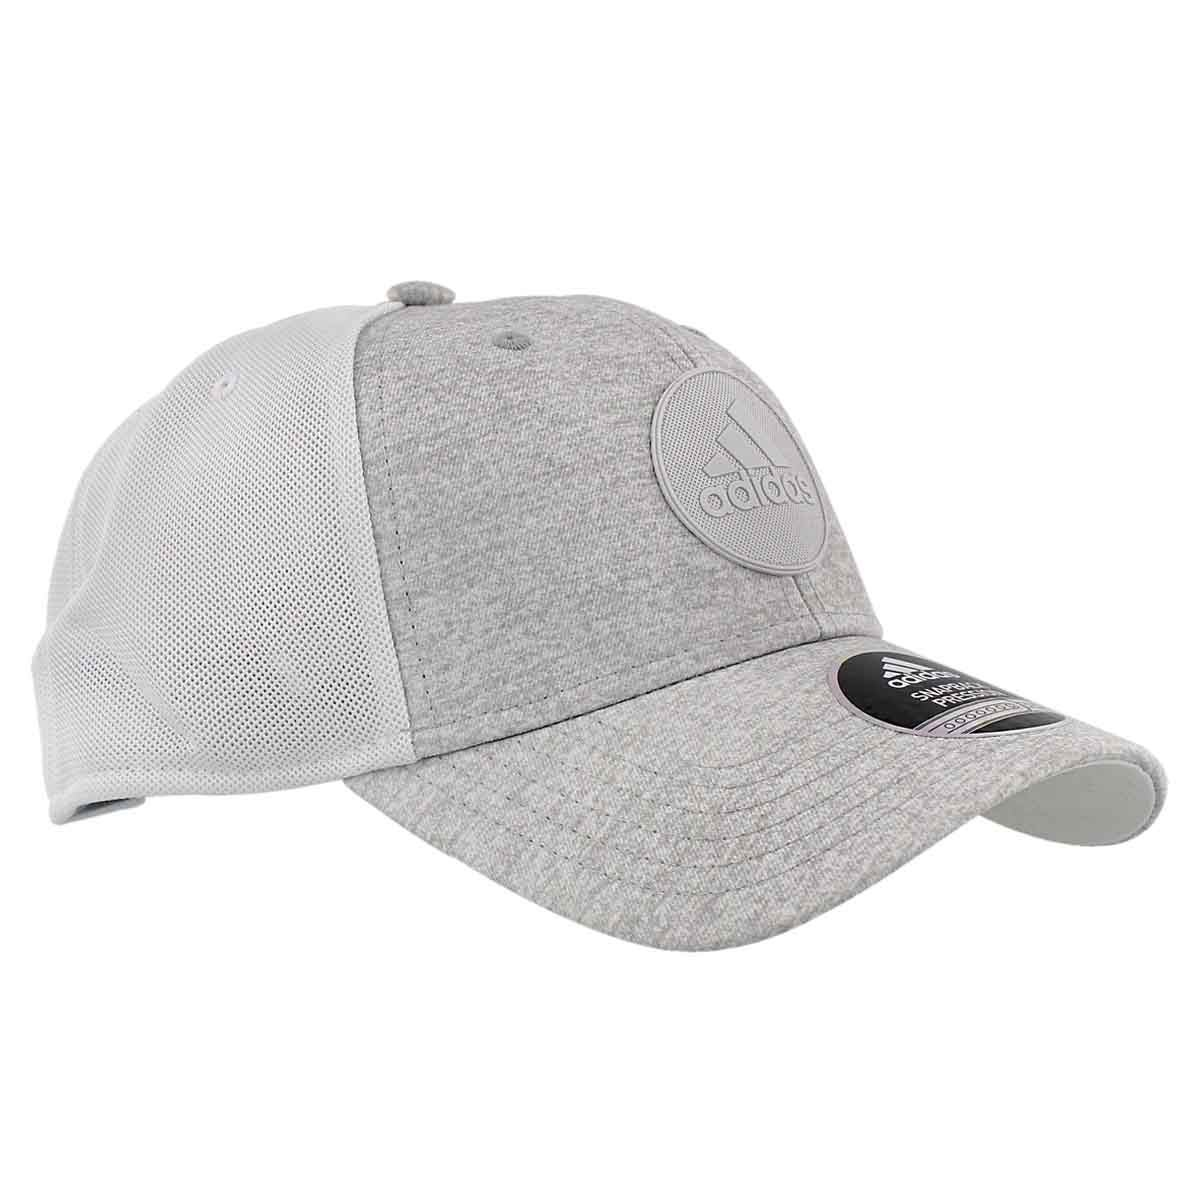 Mns Thrill jersey wht/gry snapback cap